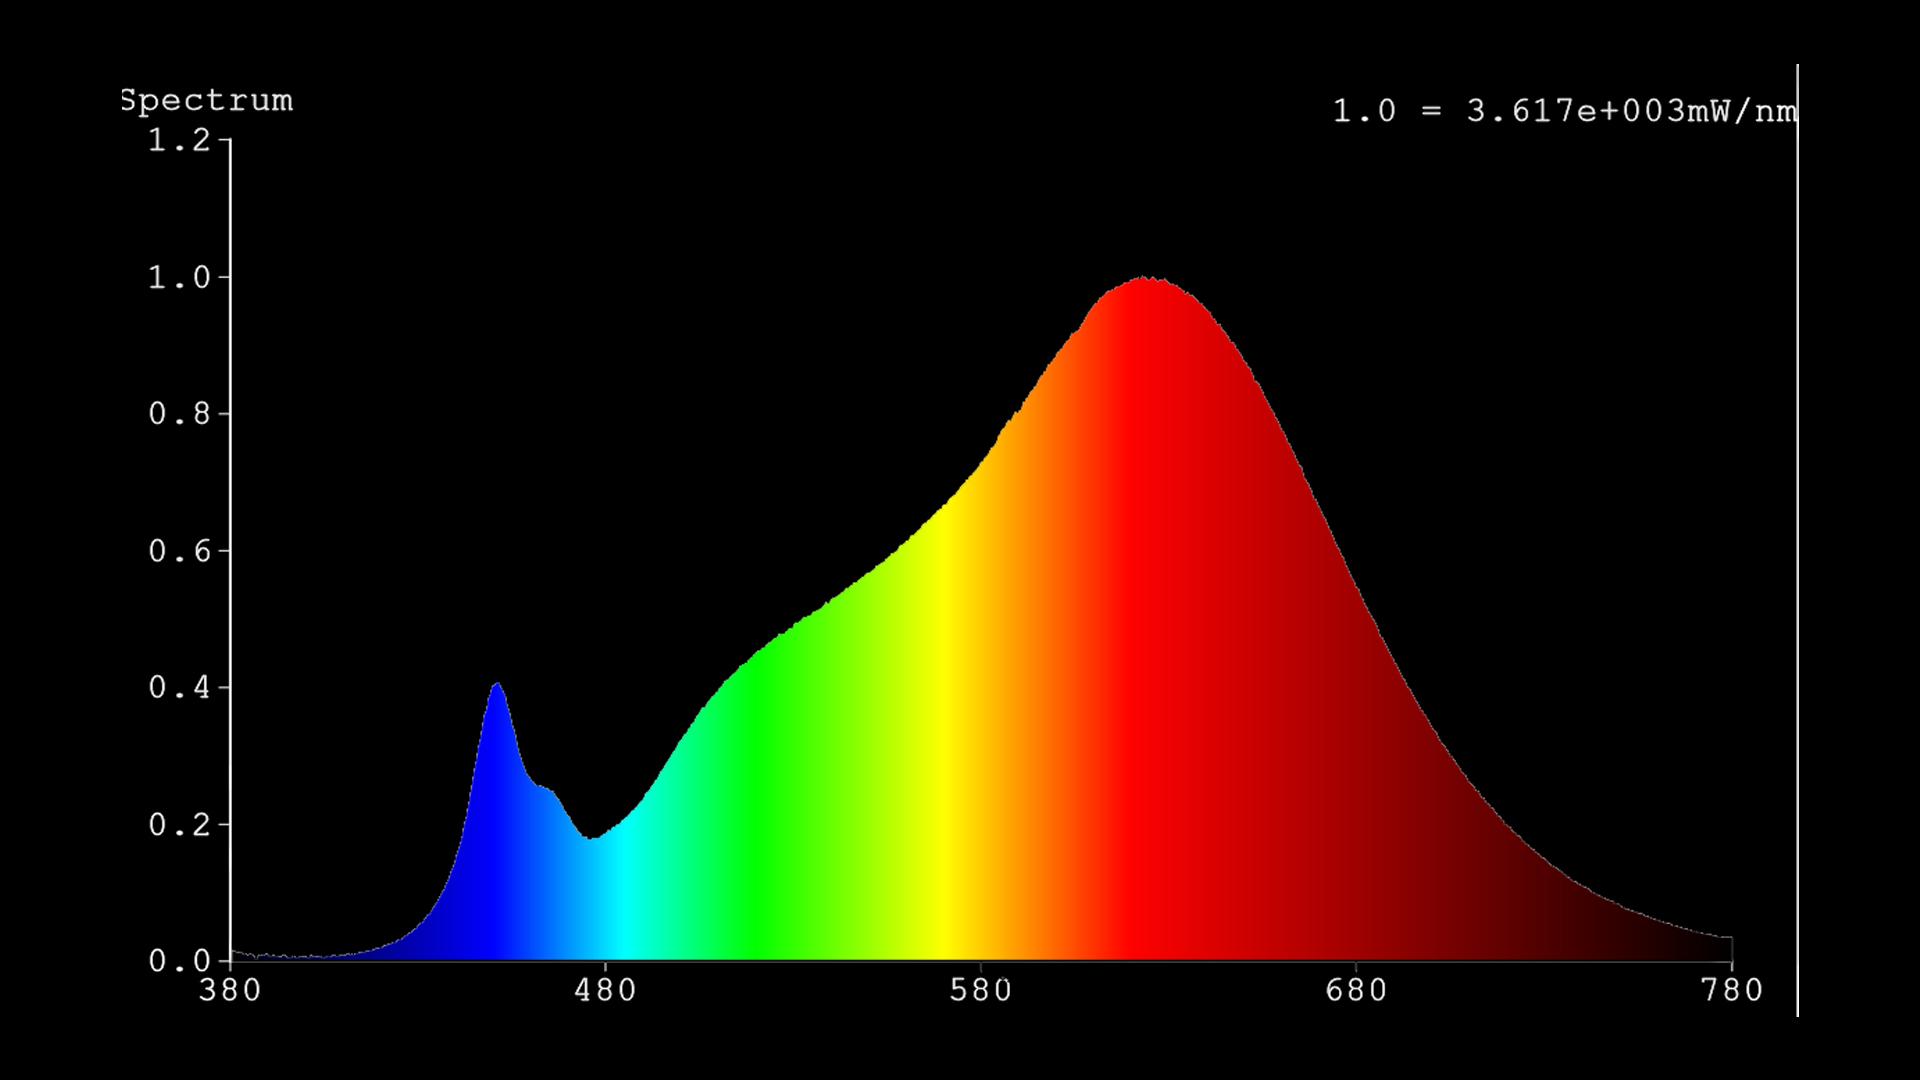 spectrumgraph.jpg